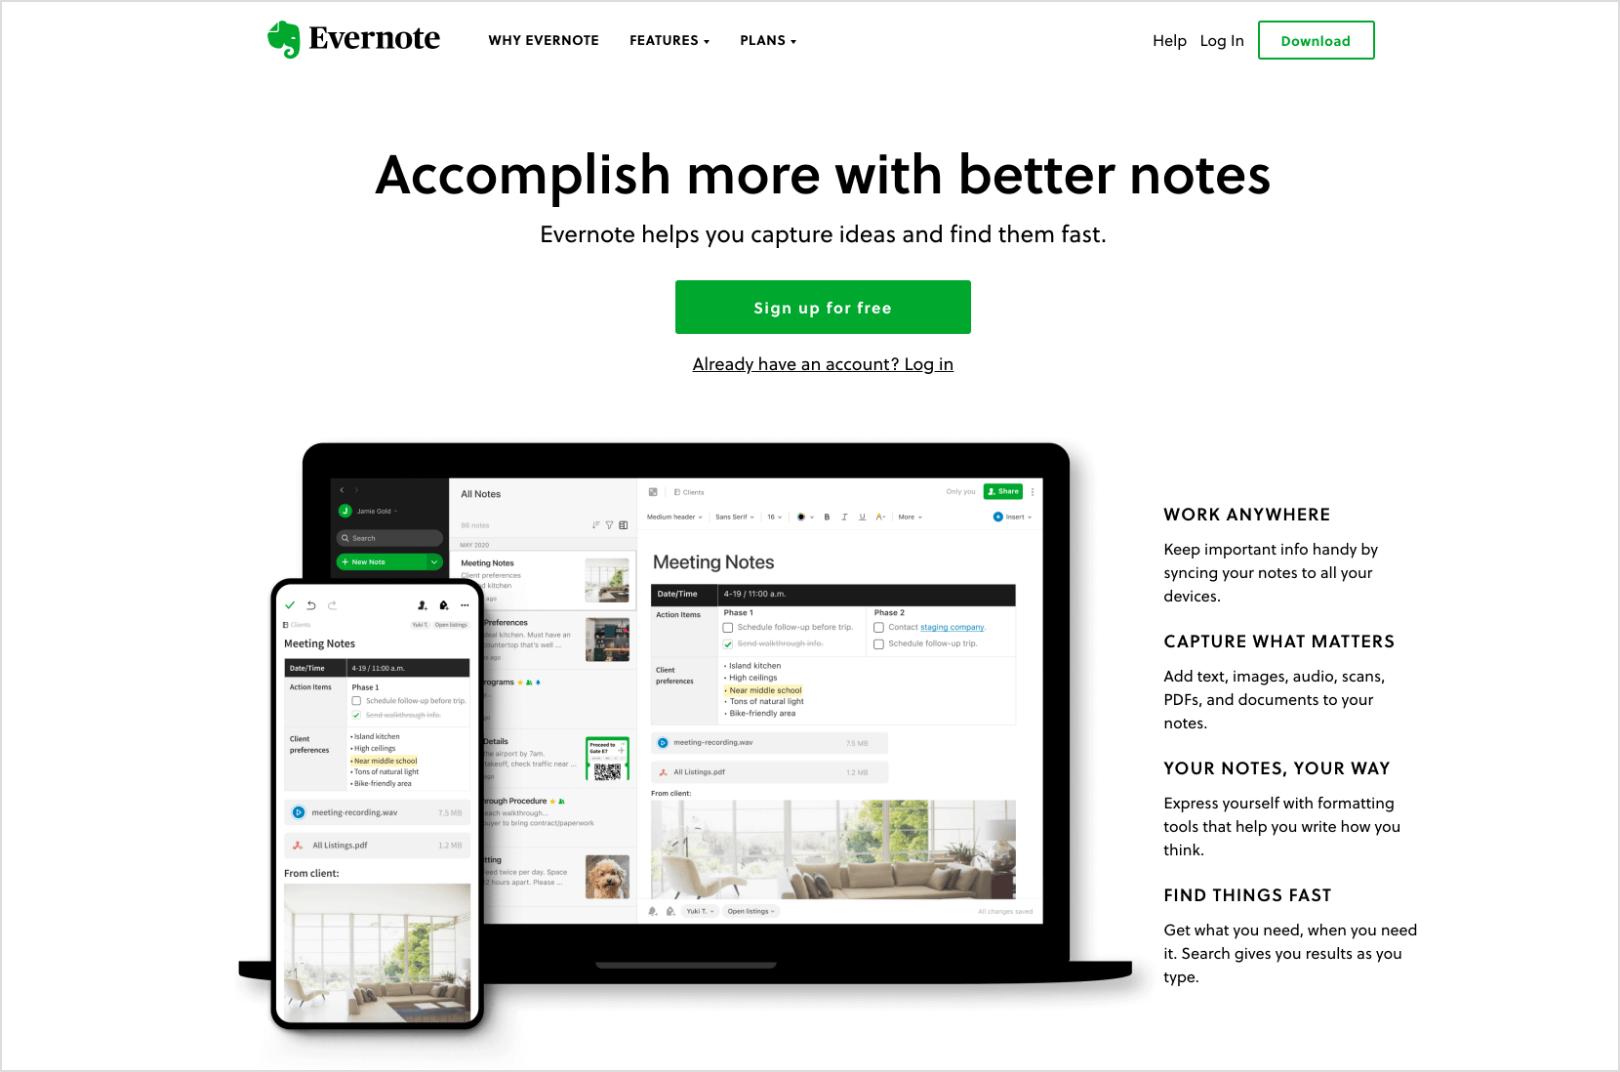 Evernote Home Page Screenshot